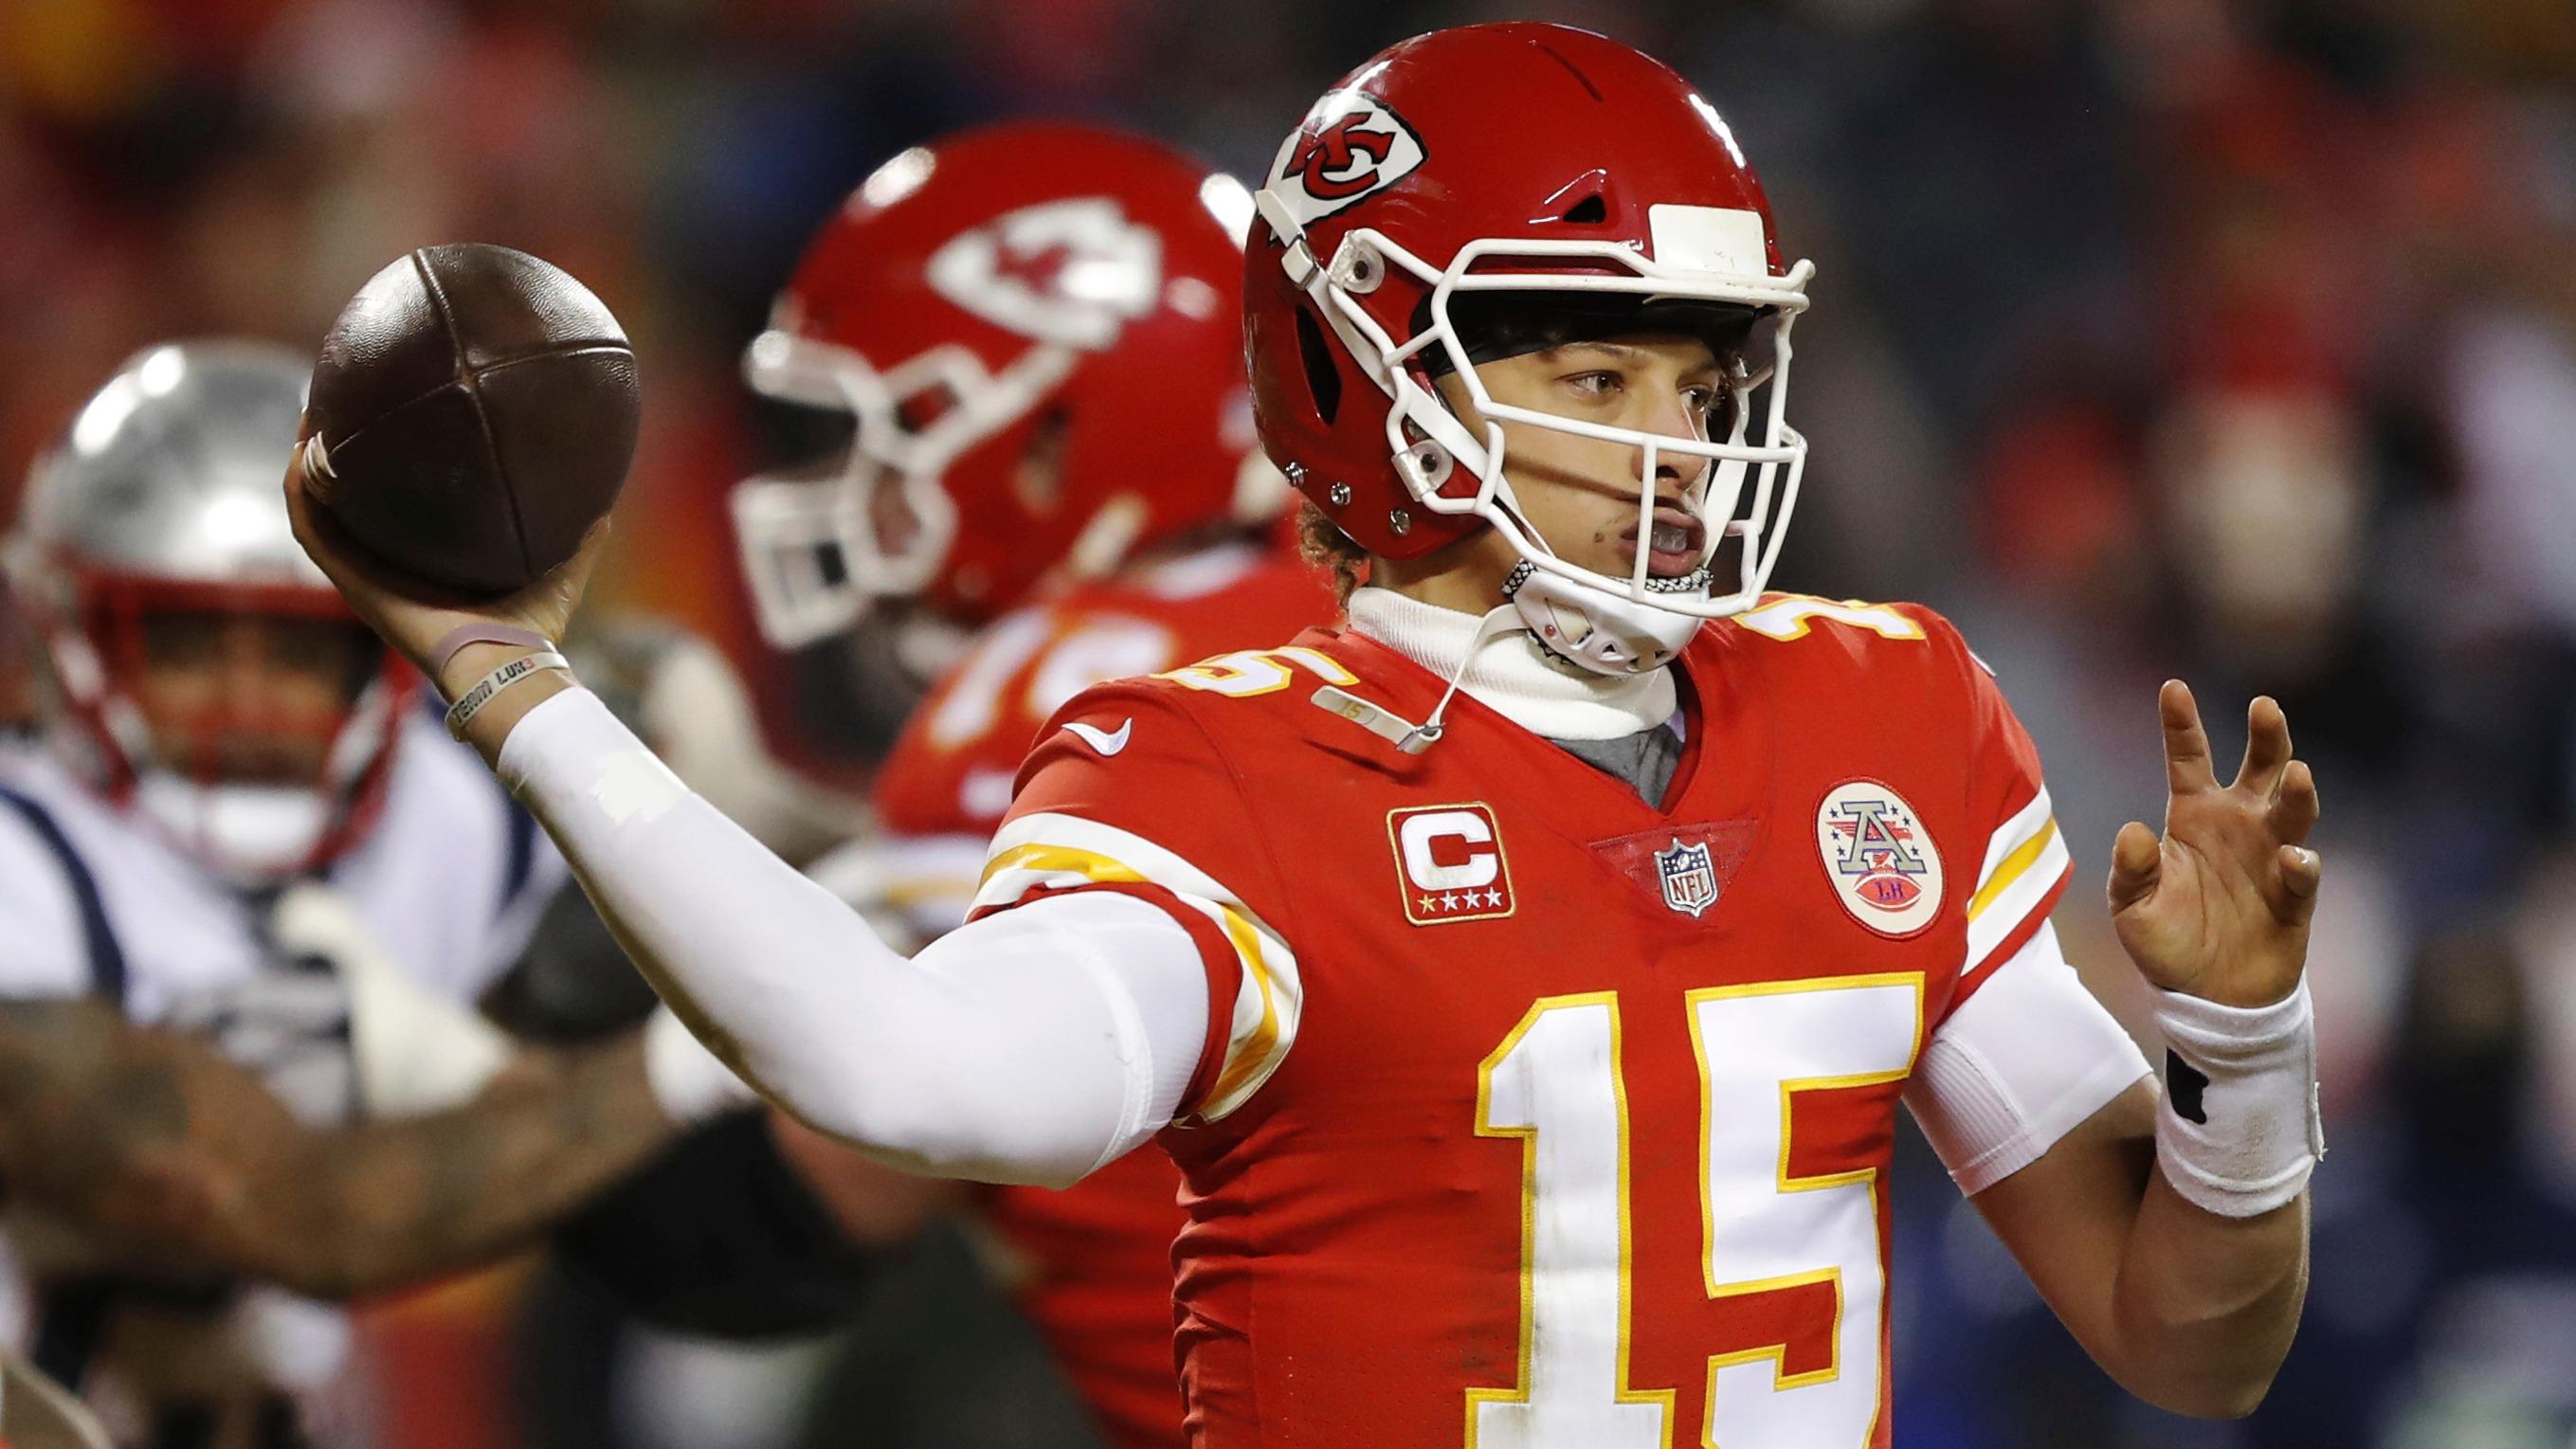 2019 Fantasy Football quarterback rankings: Patrick Mahomes